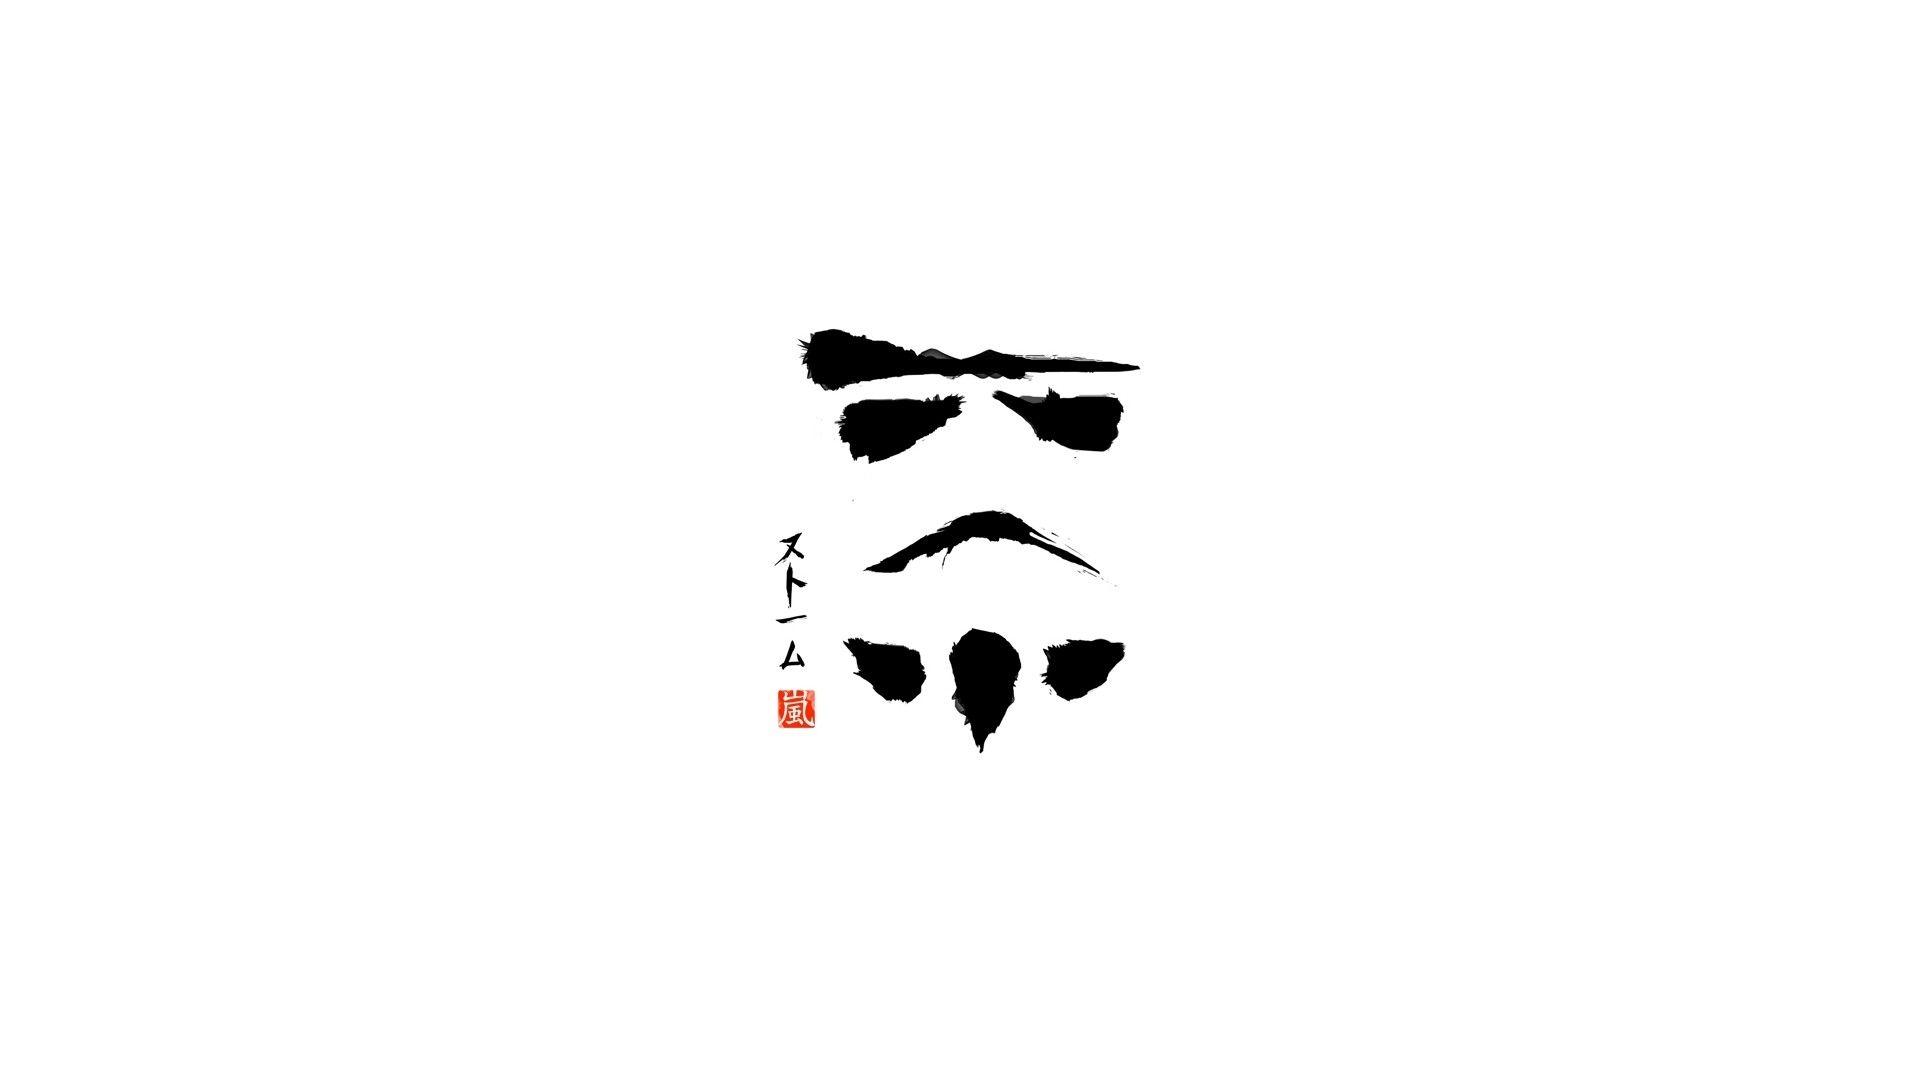 Abstract Star Wars Stormtroopers Solid Simplistic Simple 1920x1080 Wallpaper Star Wars Wallpaper Star Destroyer Wallpaper Vector Art